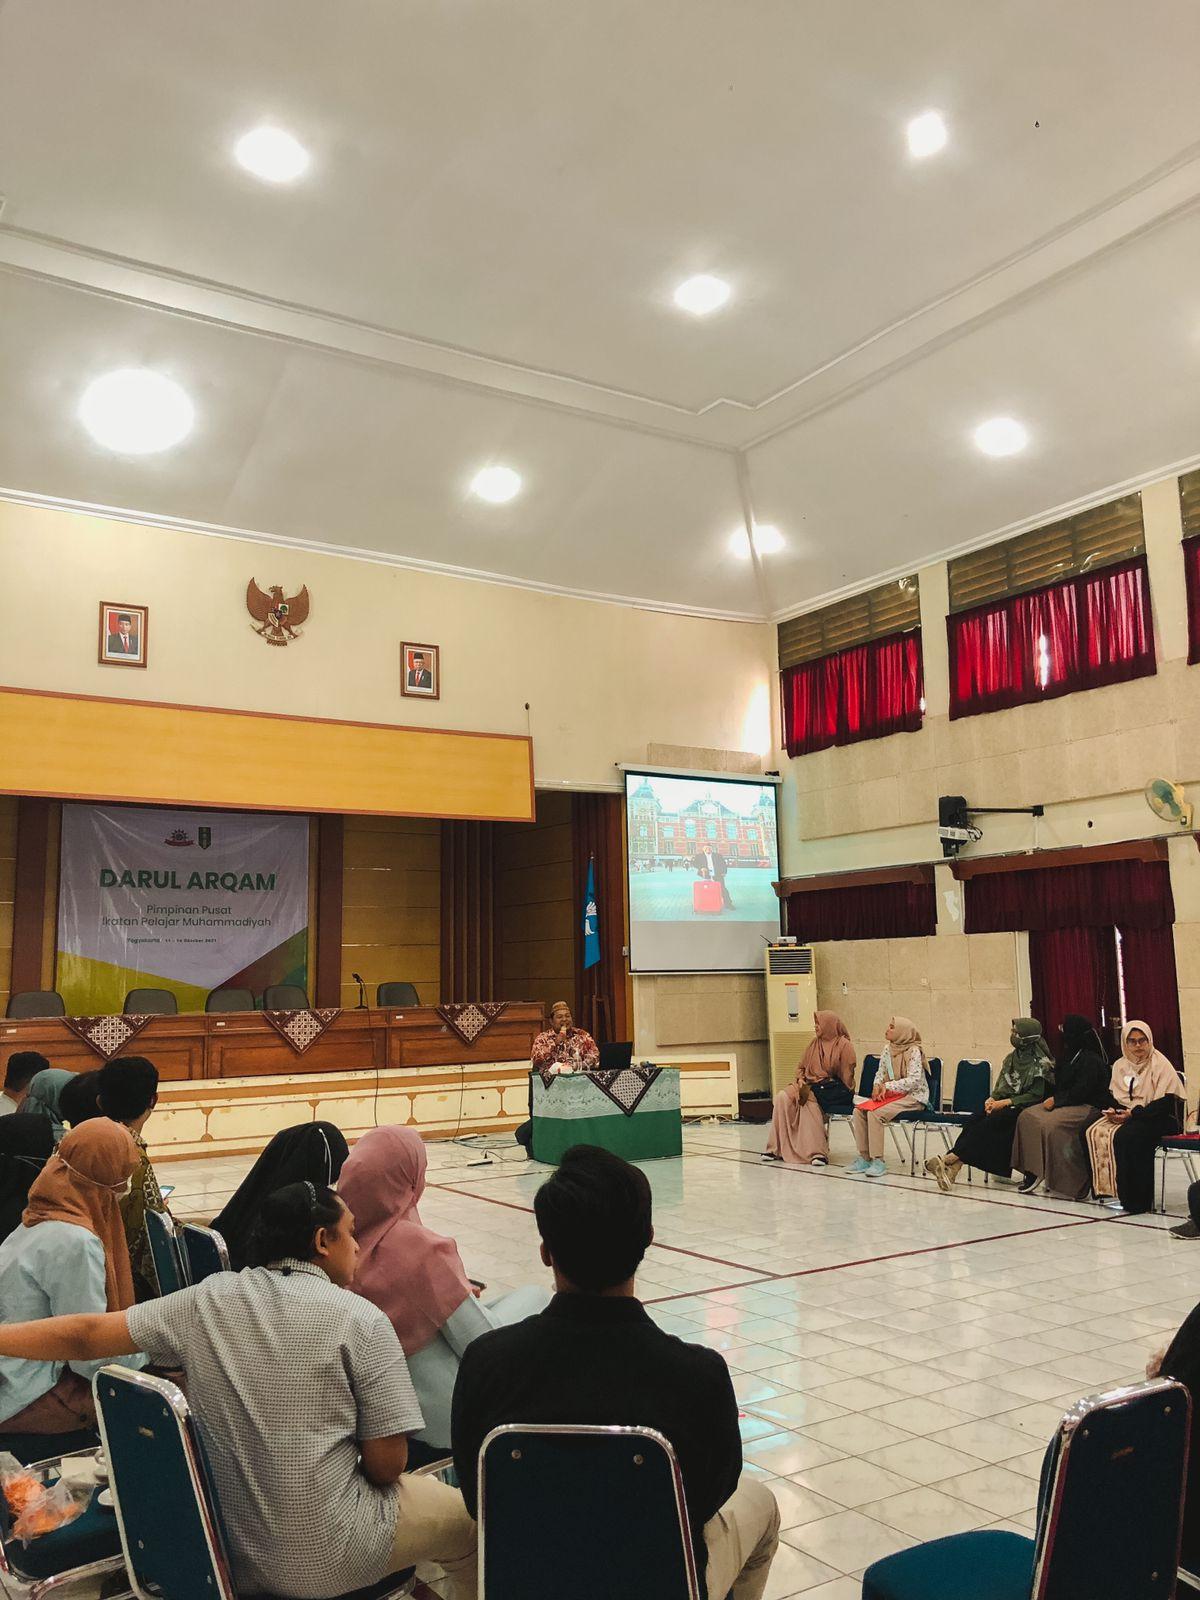 Darul Arqam PP IPM: IPM Harus Menopang Visi Internasional Muhammadiyah